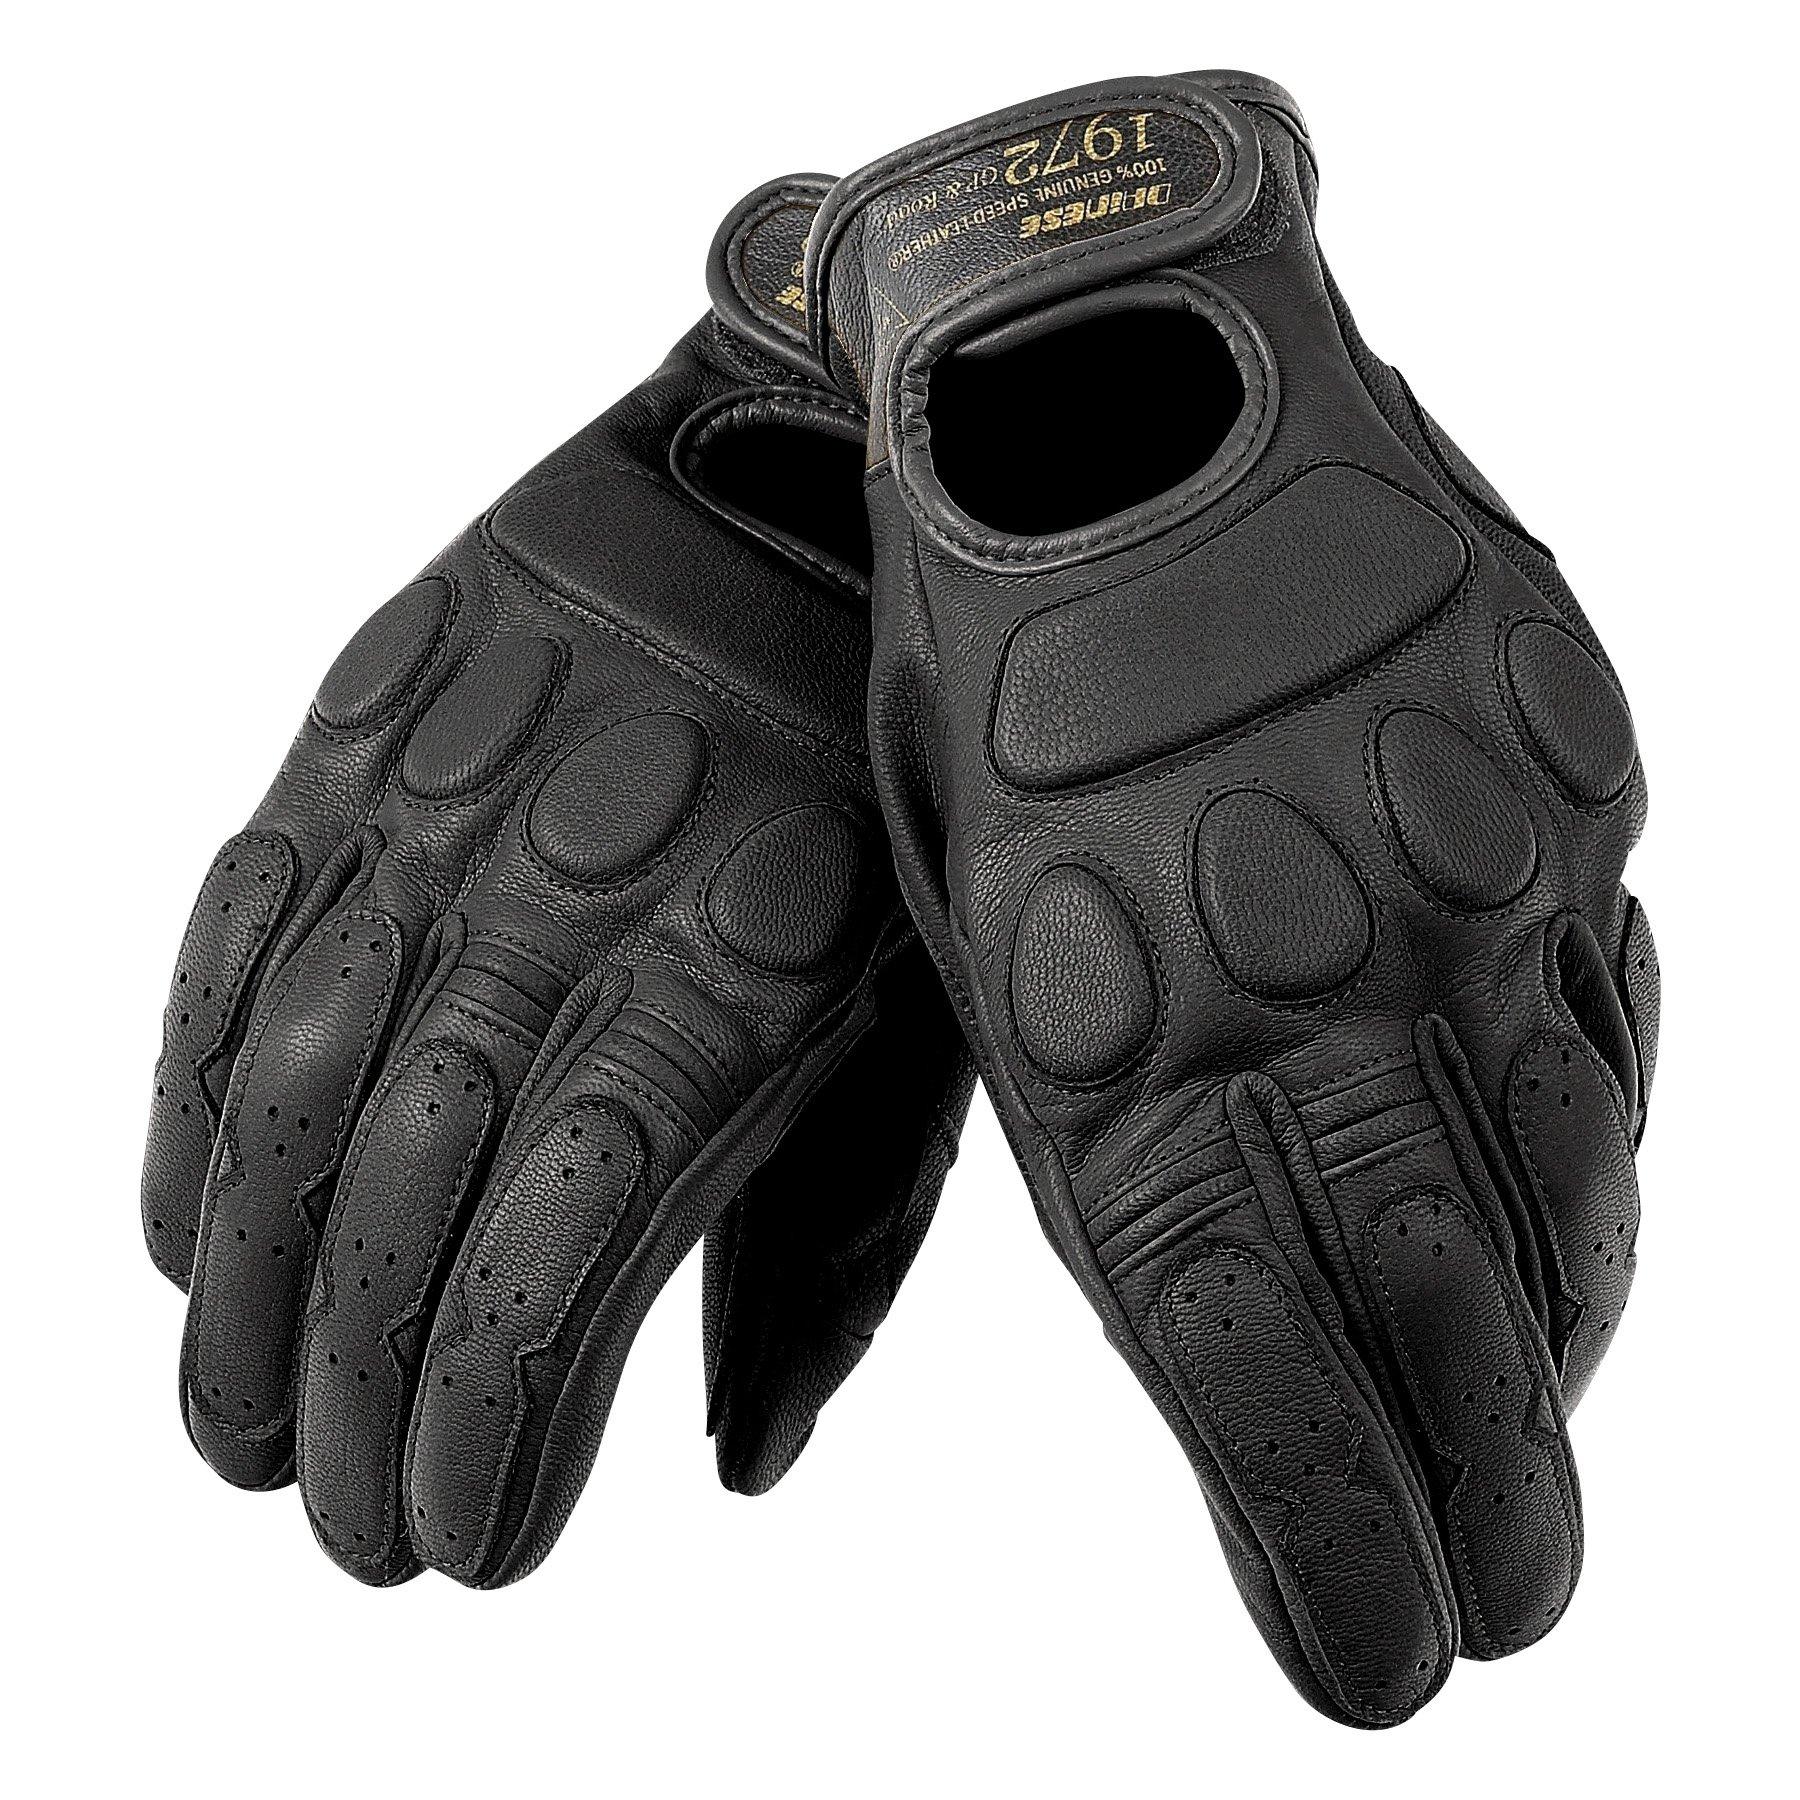 Dainese Adult Blackjack Unisex Gloves (Black), XL